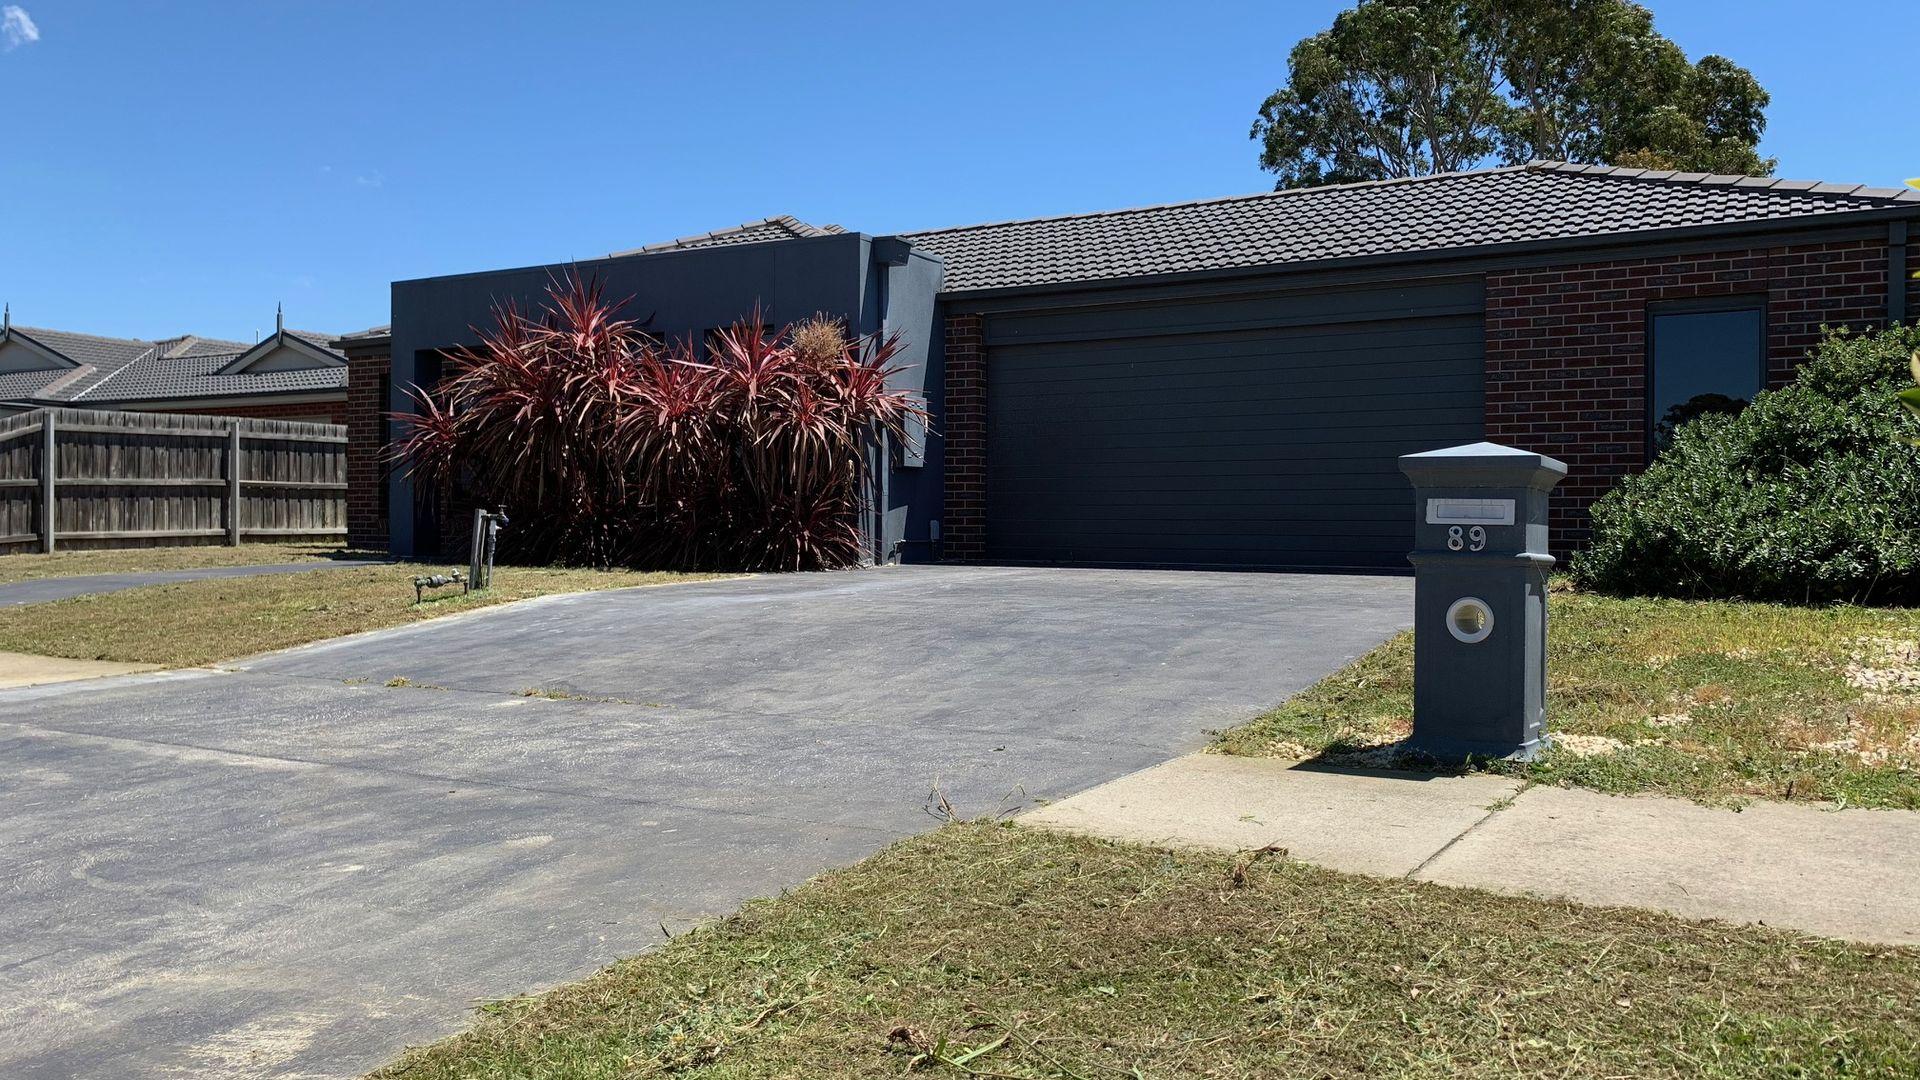 89 Gatehouse Drive, Bairnsdale VIC 3875, Image 1